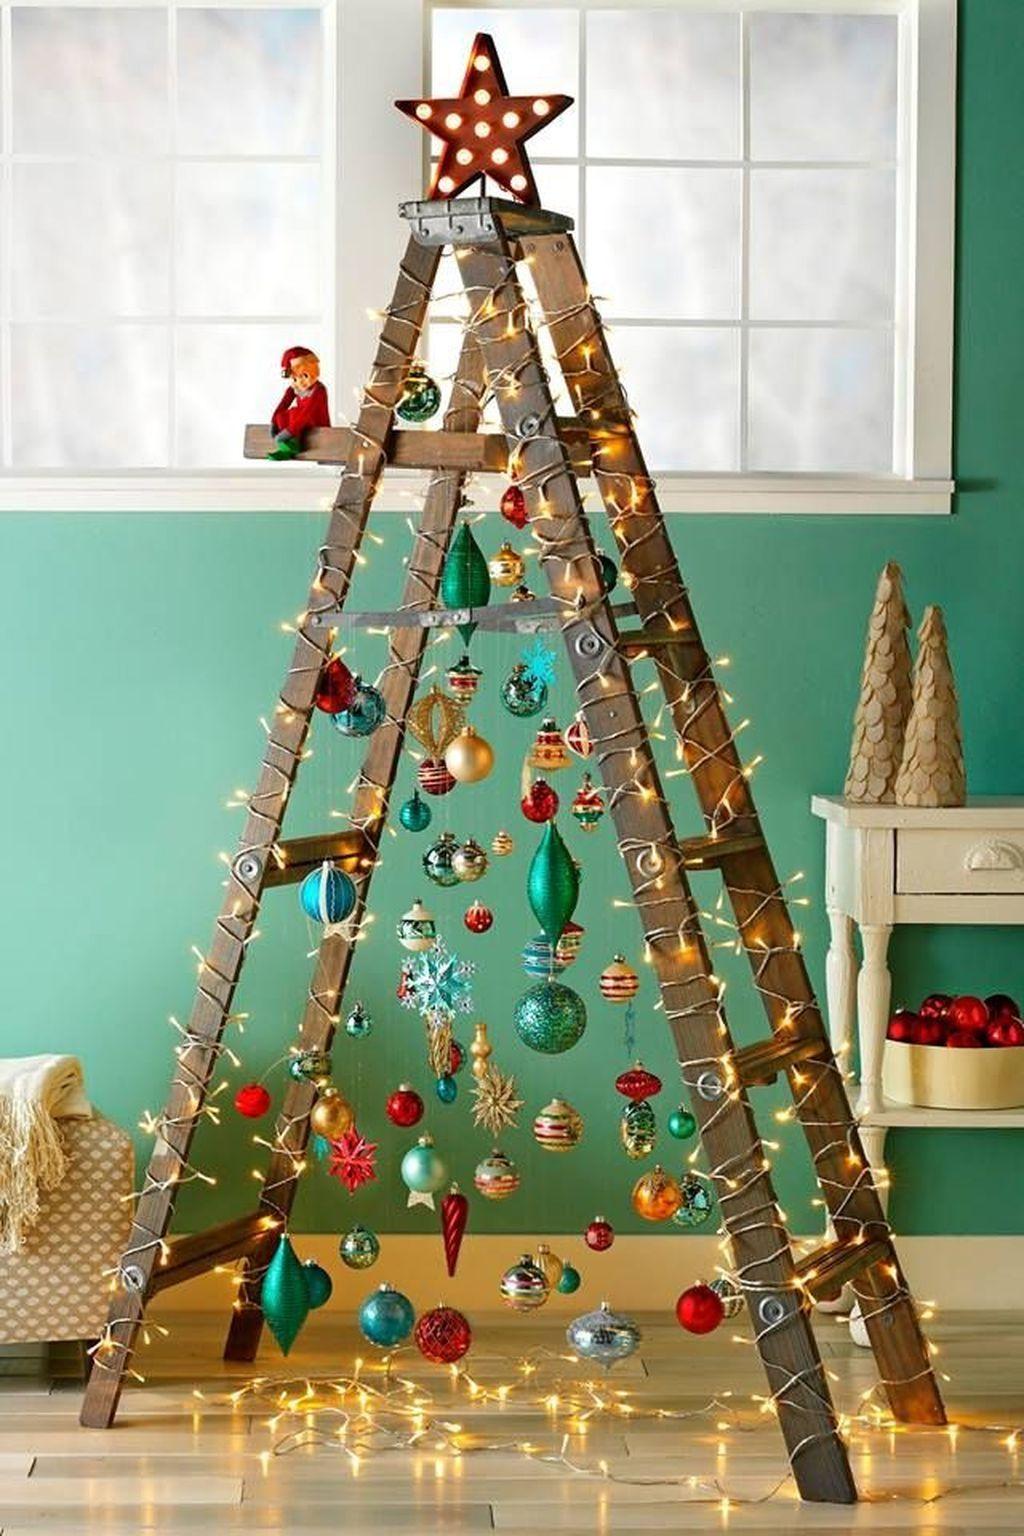 20 Creative Christmas Tree Alternatives Ideas On A Budget Different Christmas Trees Creative Christmas Trees Unusual Christmas Trees